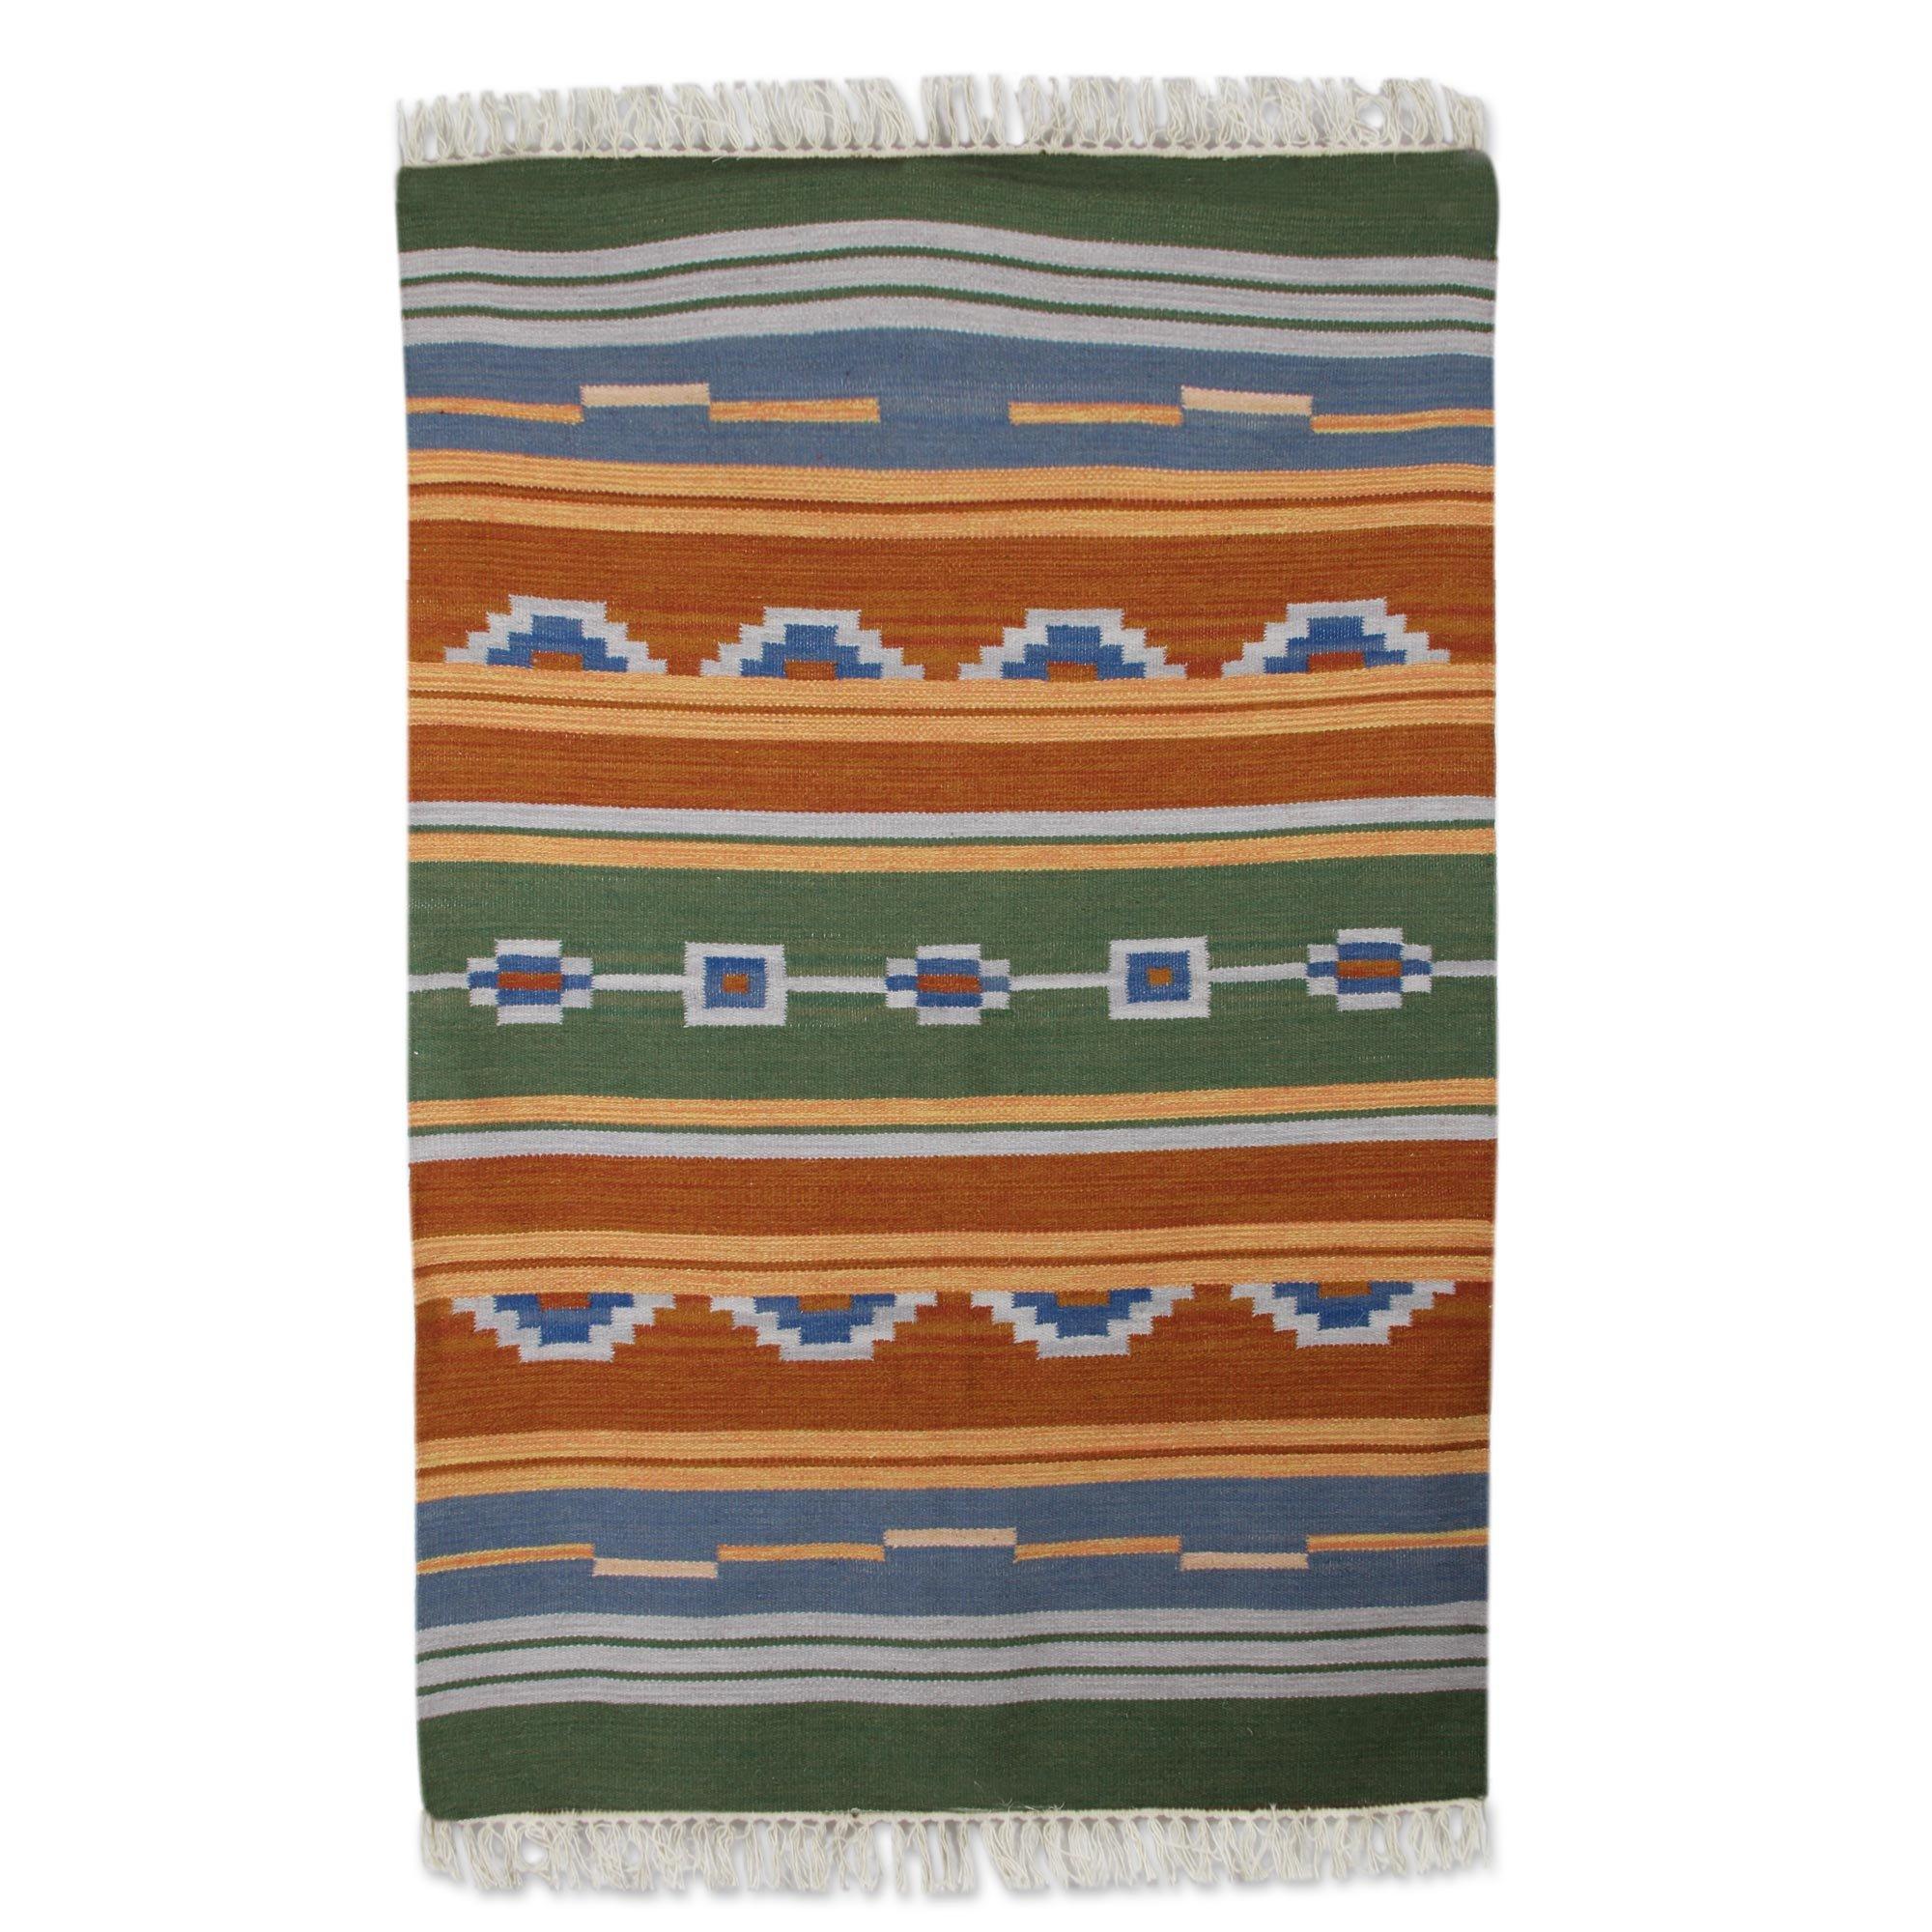 NOVICA Green Orange Wool Hand Woven Area Rug (4x6), 'Desert Dunes'